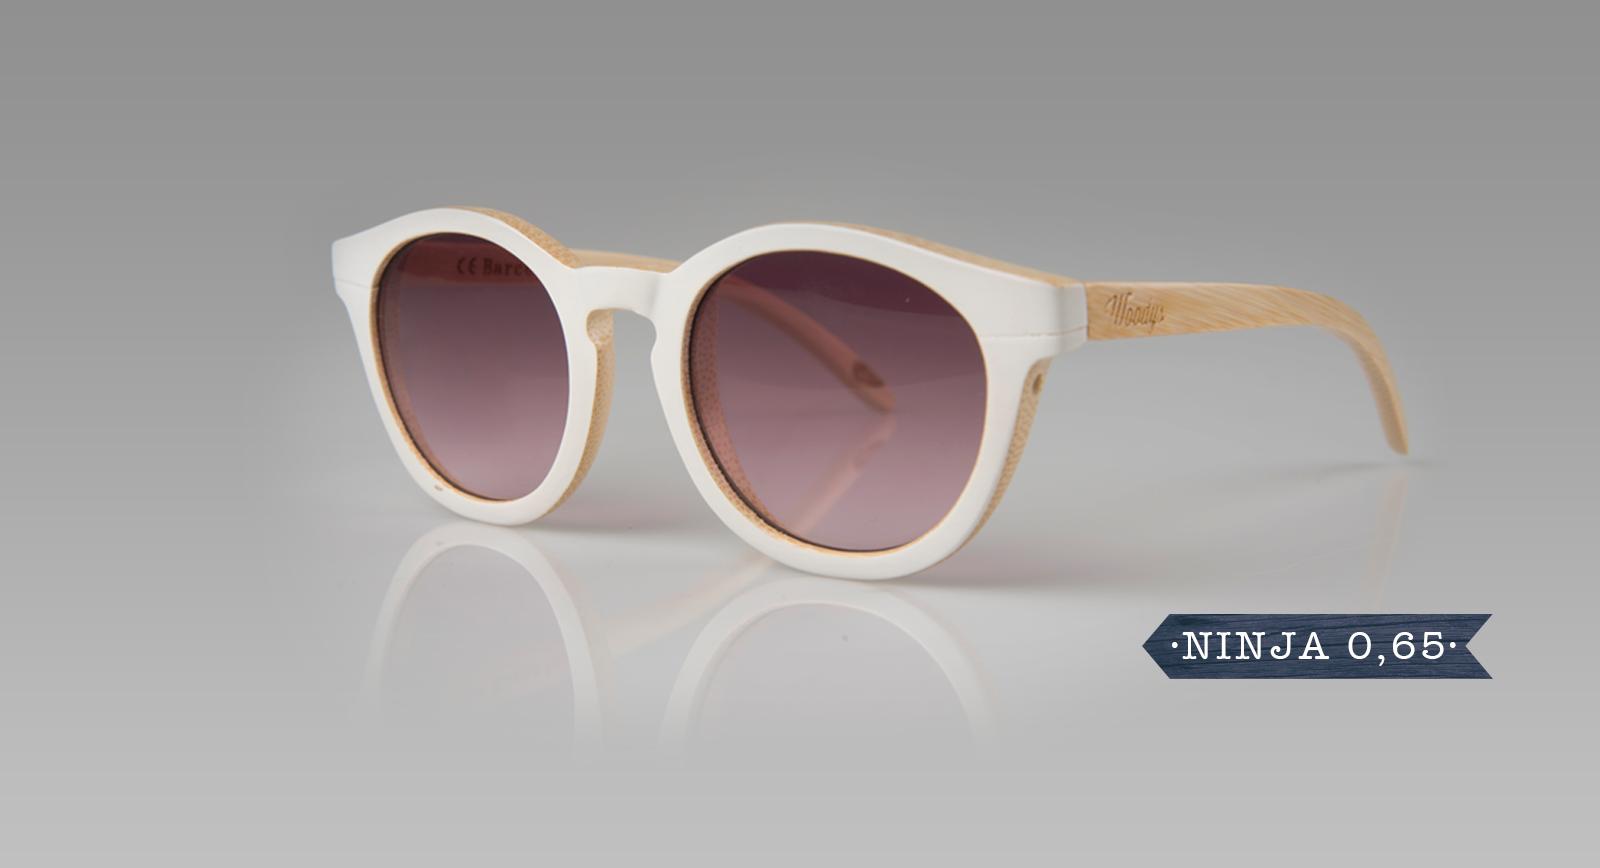 Wood sunglasses, gafas de madera, gafas madera